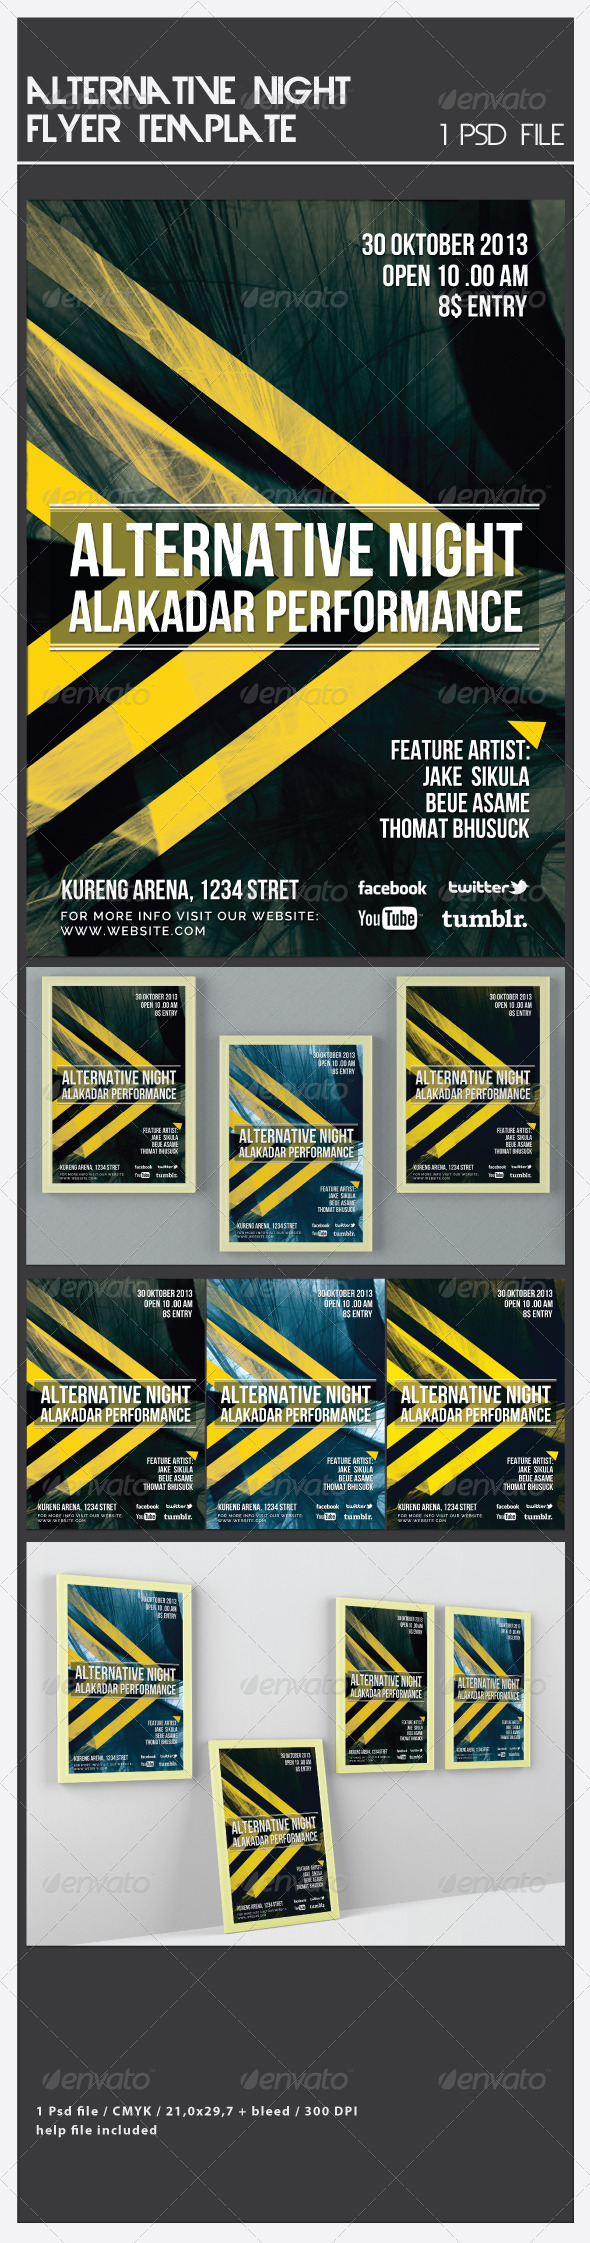 Alternative Night Flyer Template - Flyers Print Templates